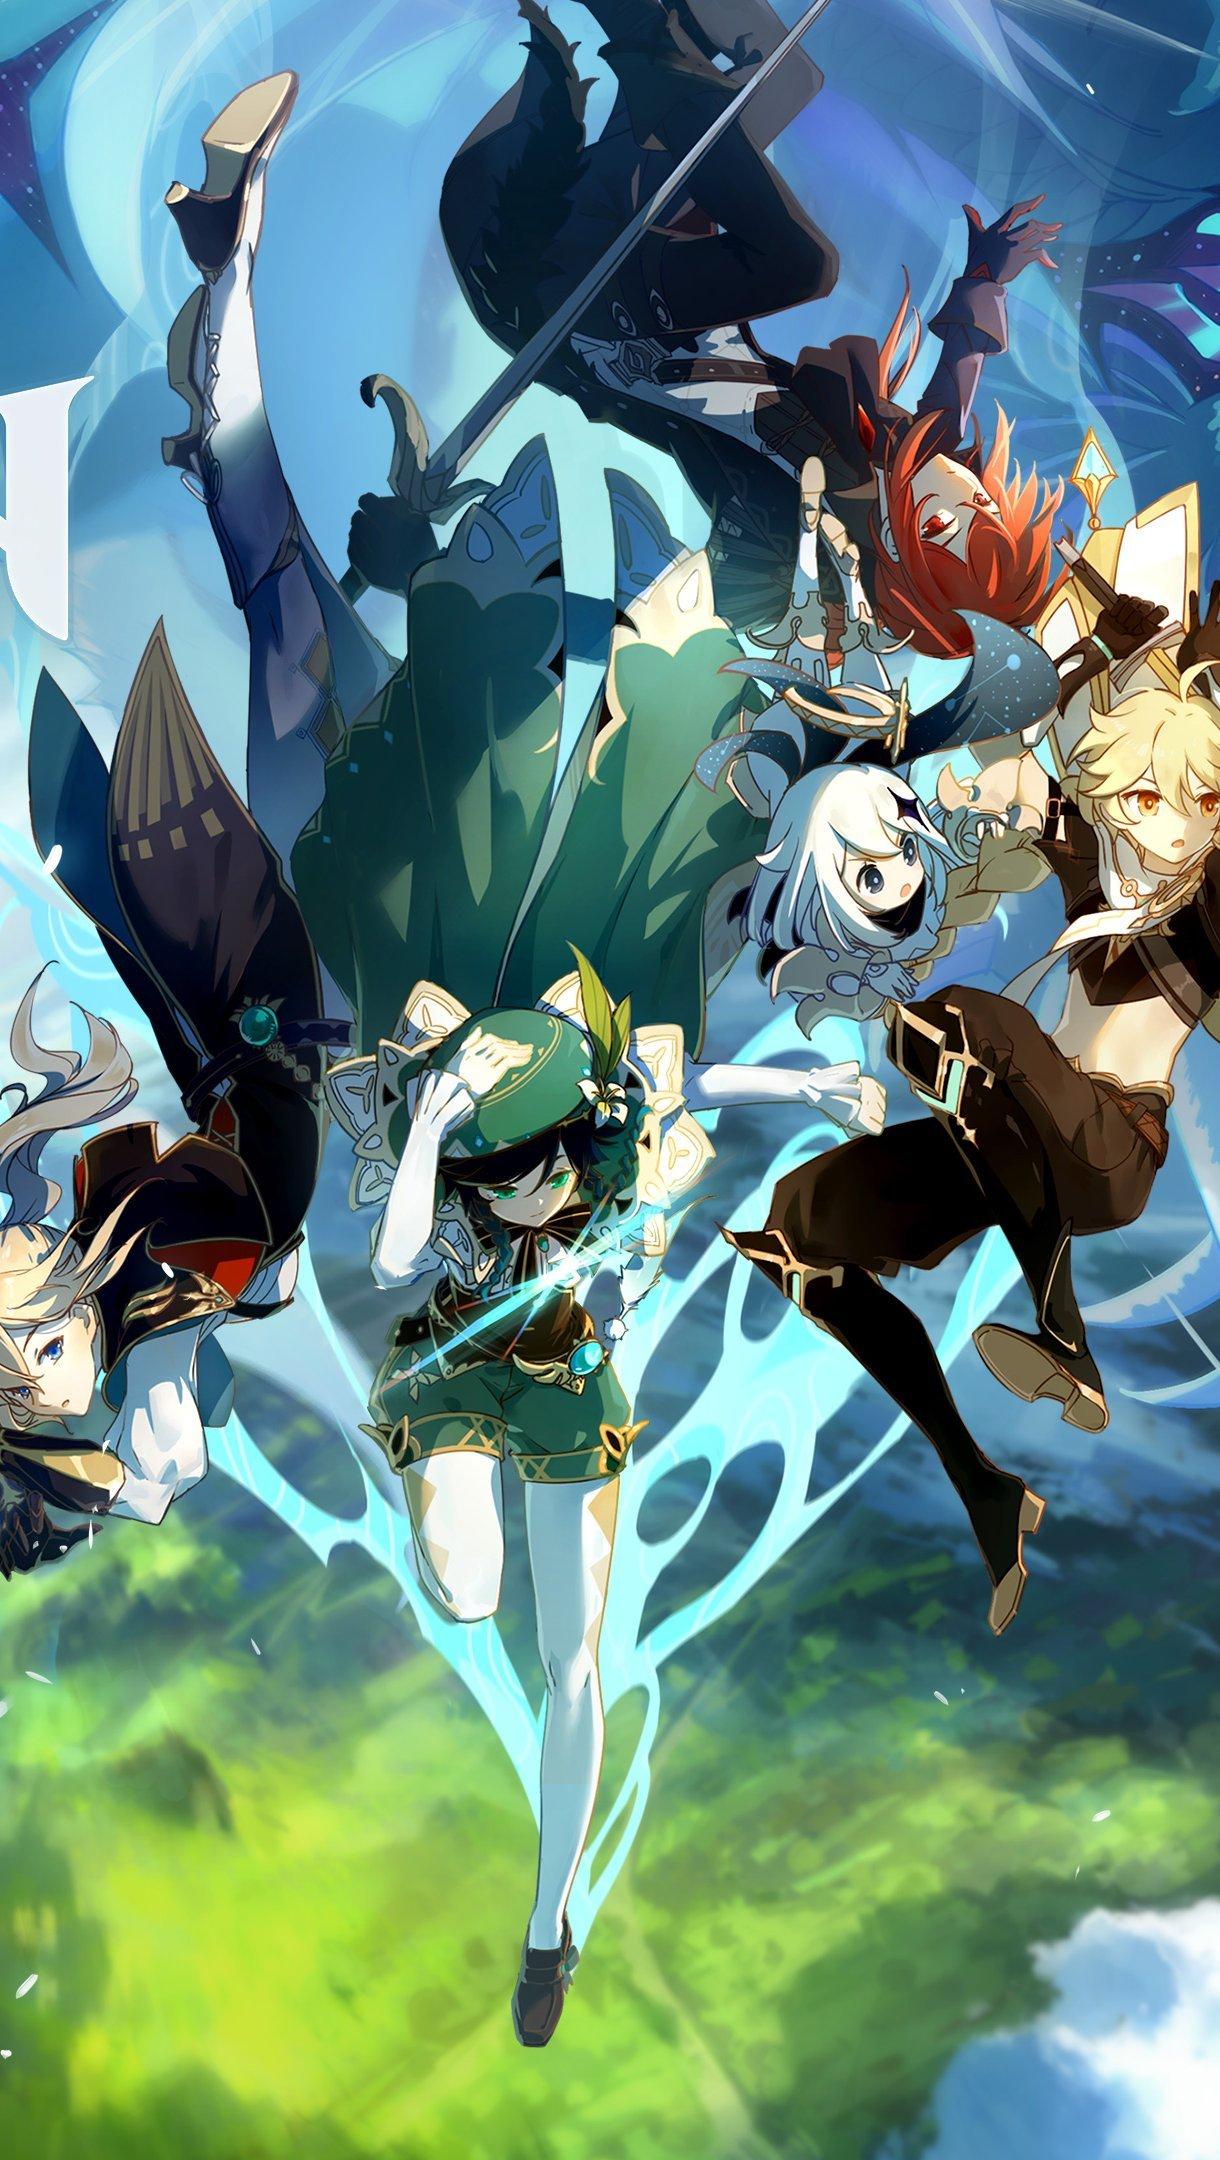 Fondos de pantalla Genshin Impact Personajes Vertical